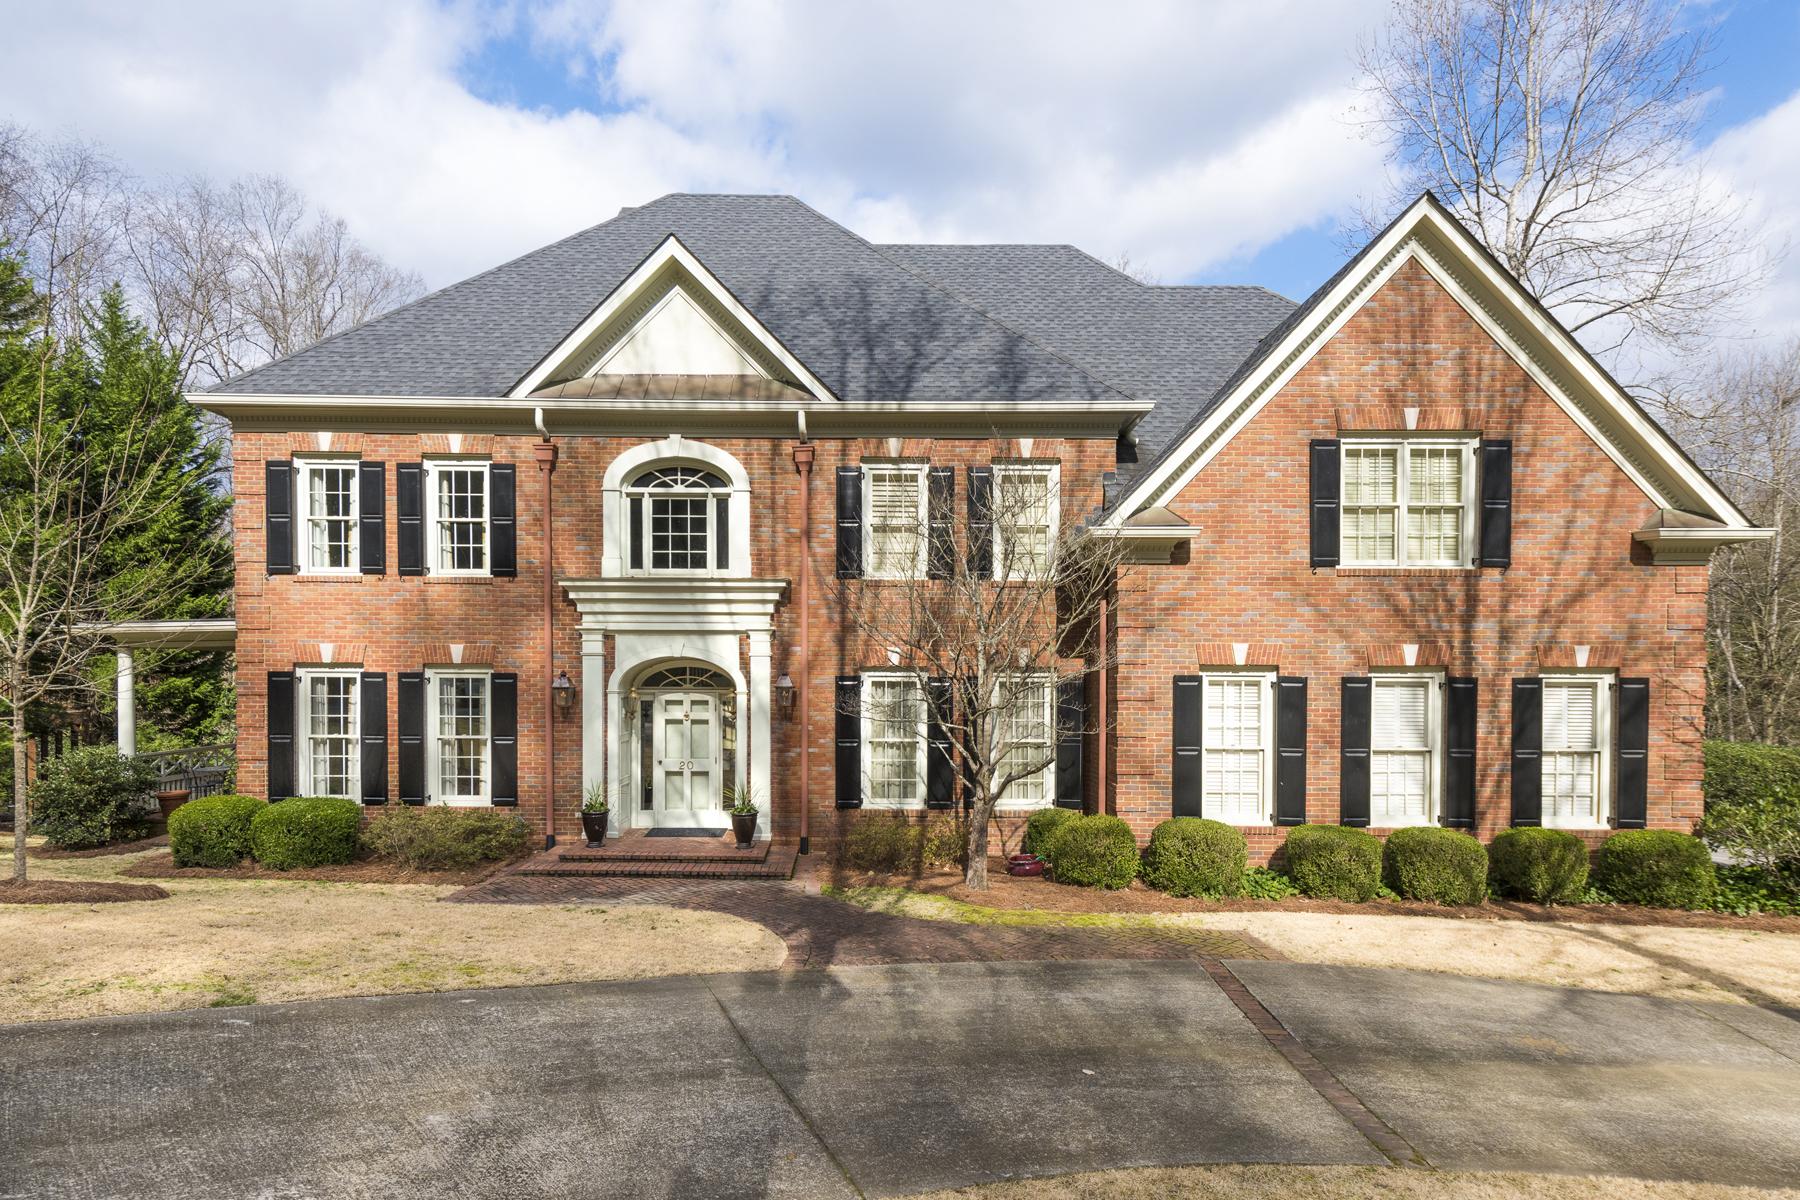 Частный односемейный дом для того Продажа на Wonderful Well Maintained Home On Private Cul-de-sac 20 Asheworth Court NW Buckhead, Atlanta, Джорджия, 30327 Соединенные Штаты